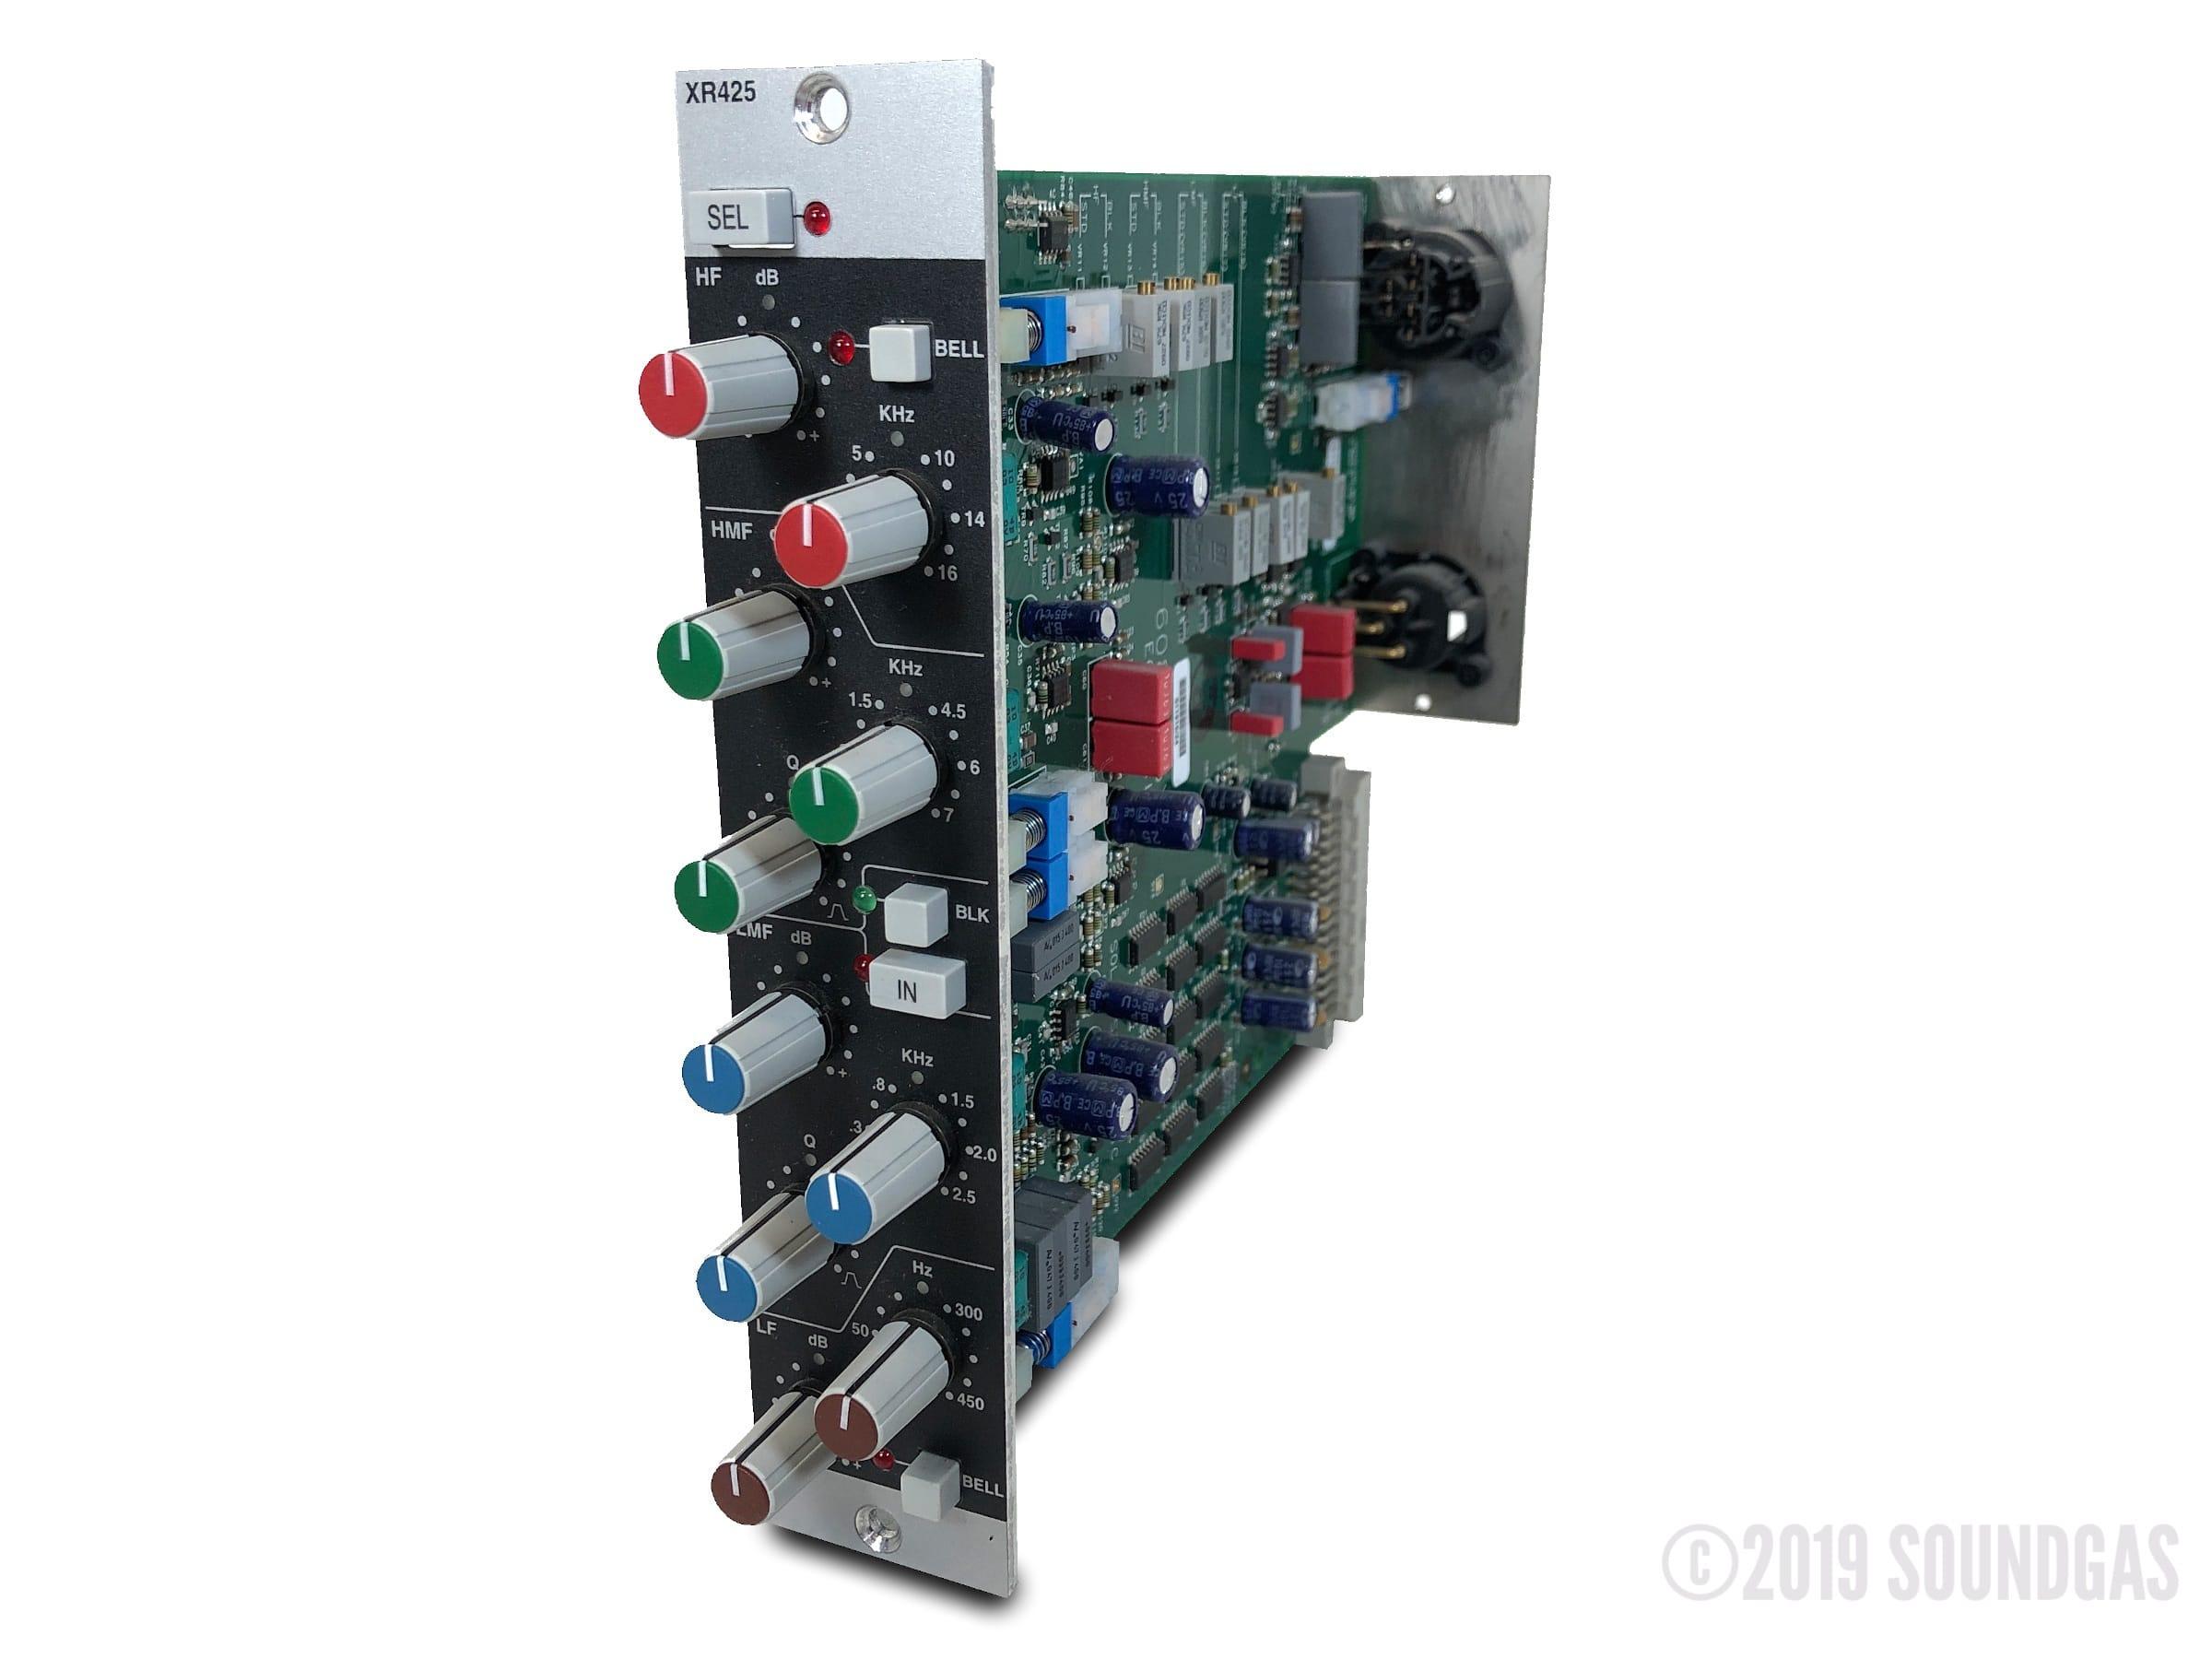 SSL-XR425-Rack-Unit-SN14-Cover-2